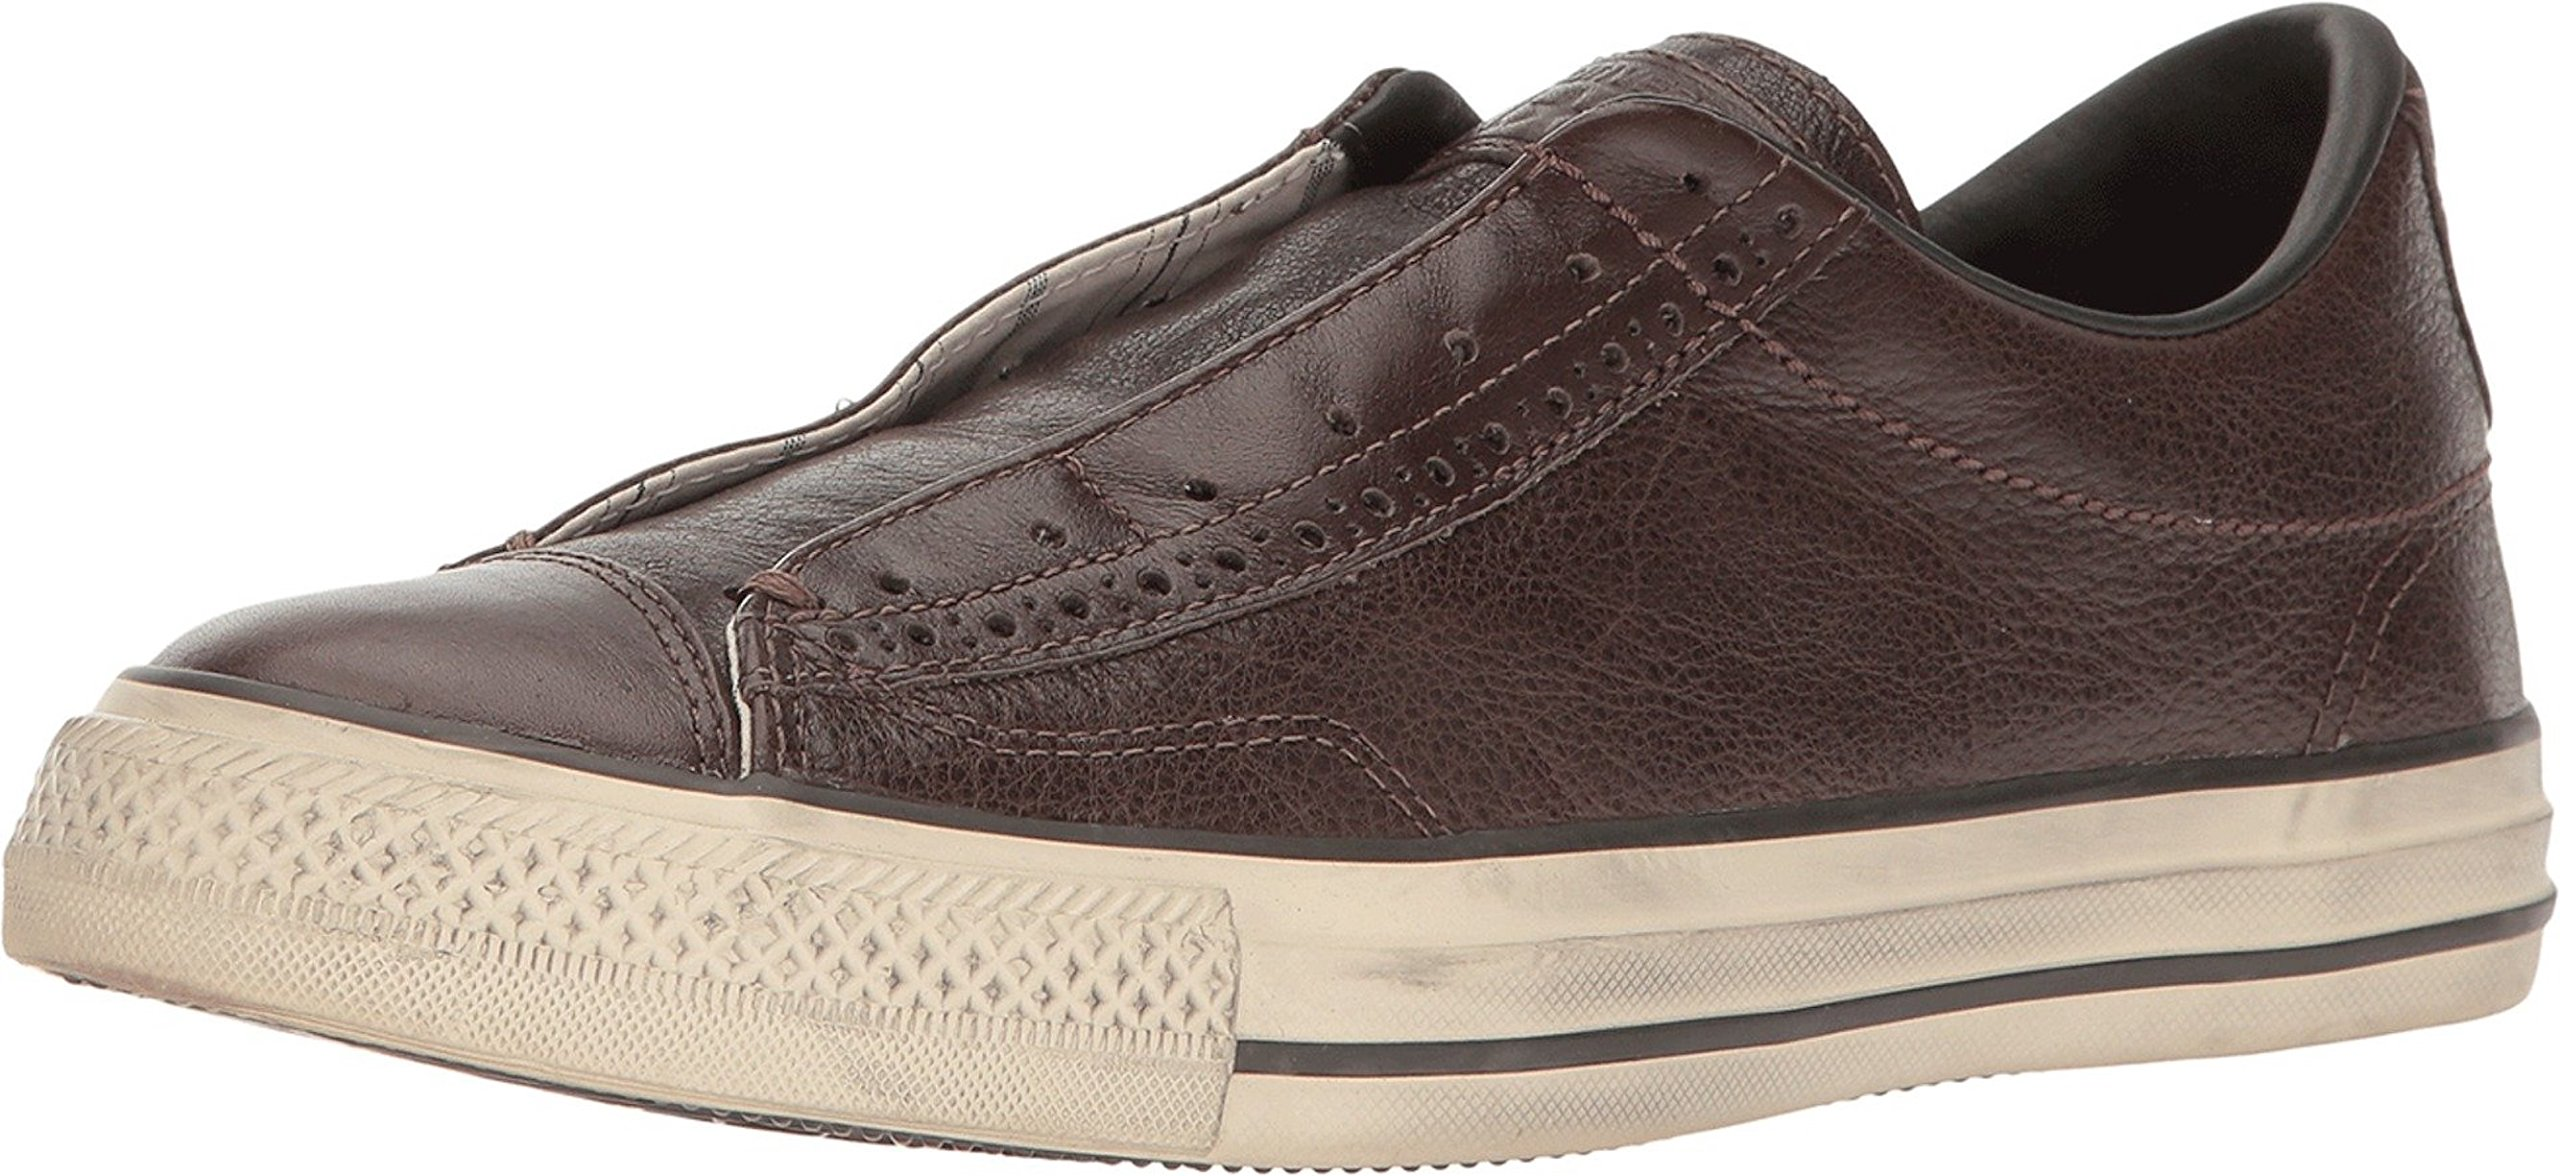 Converse by John Varvatos Leather Vintage Slip On Sneaker Chocolate Brown (10.5 M US)